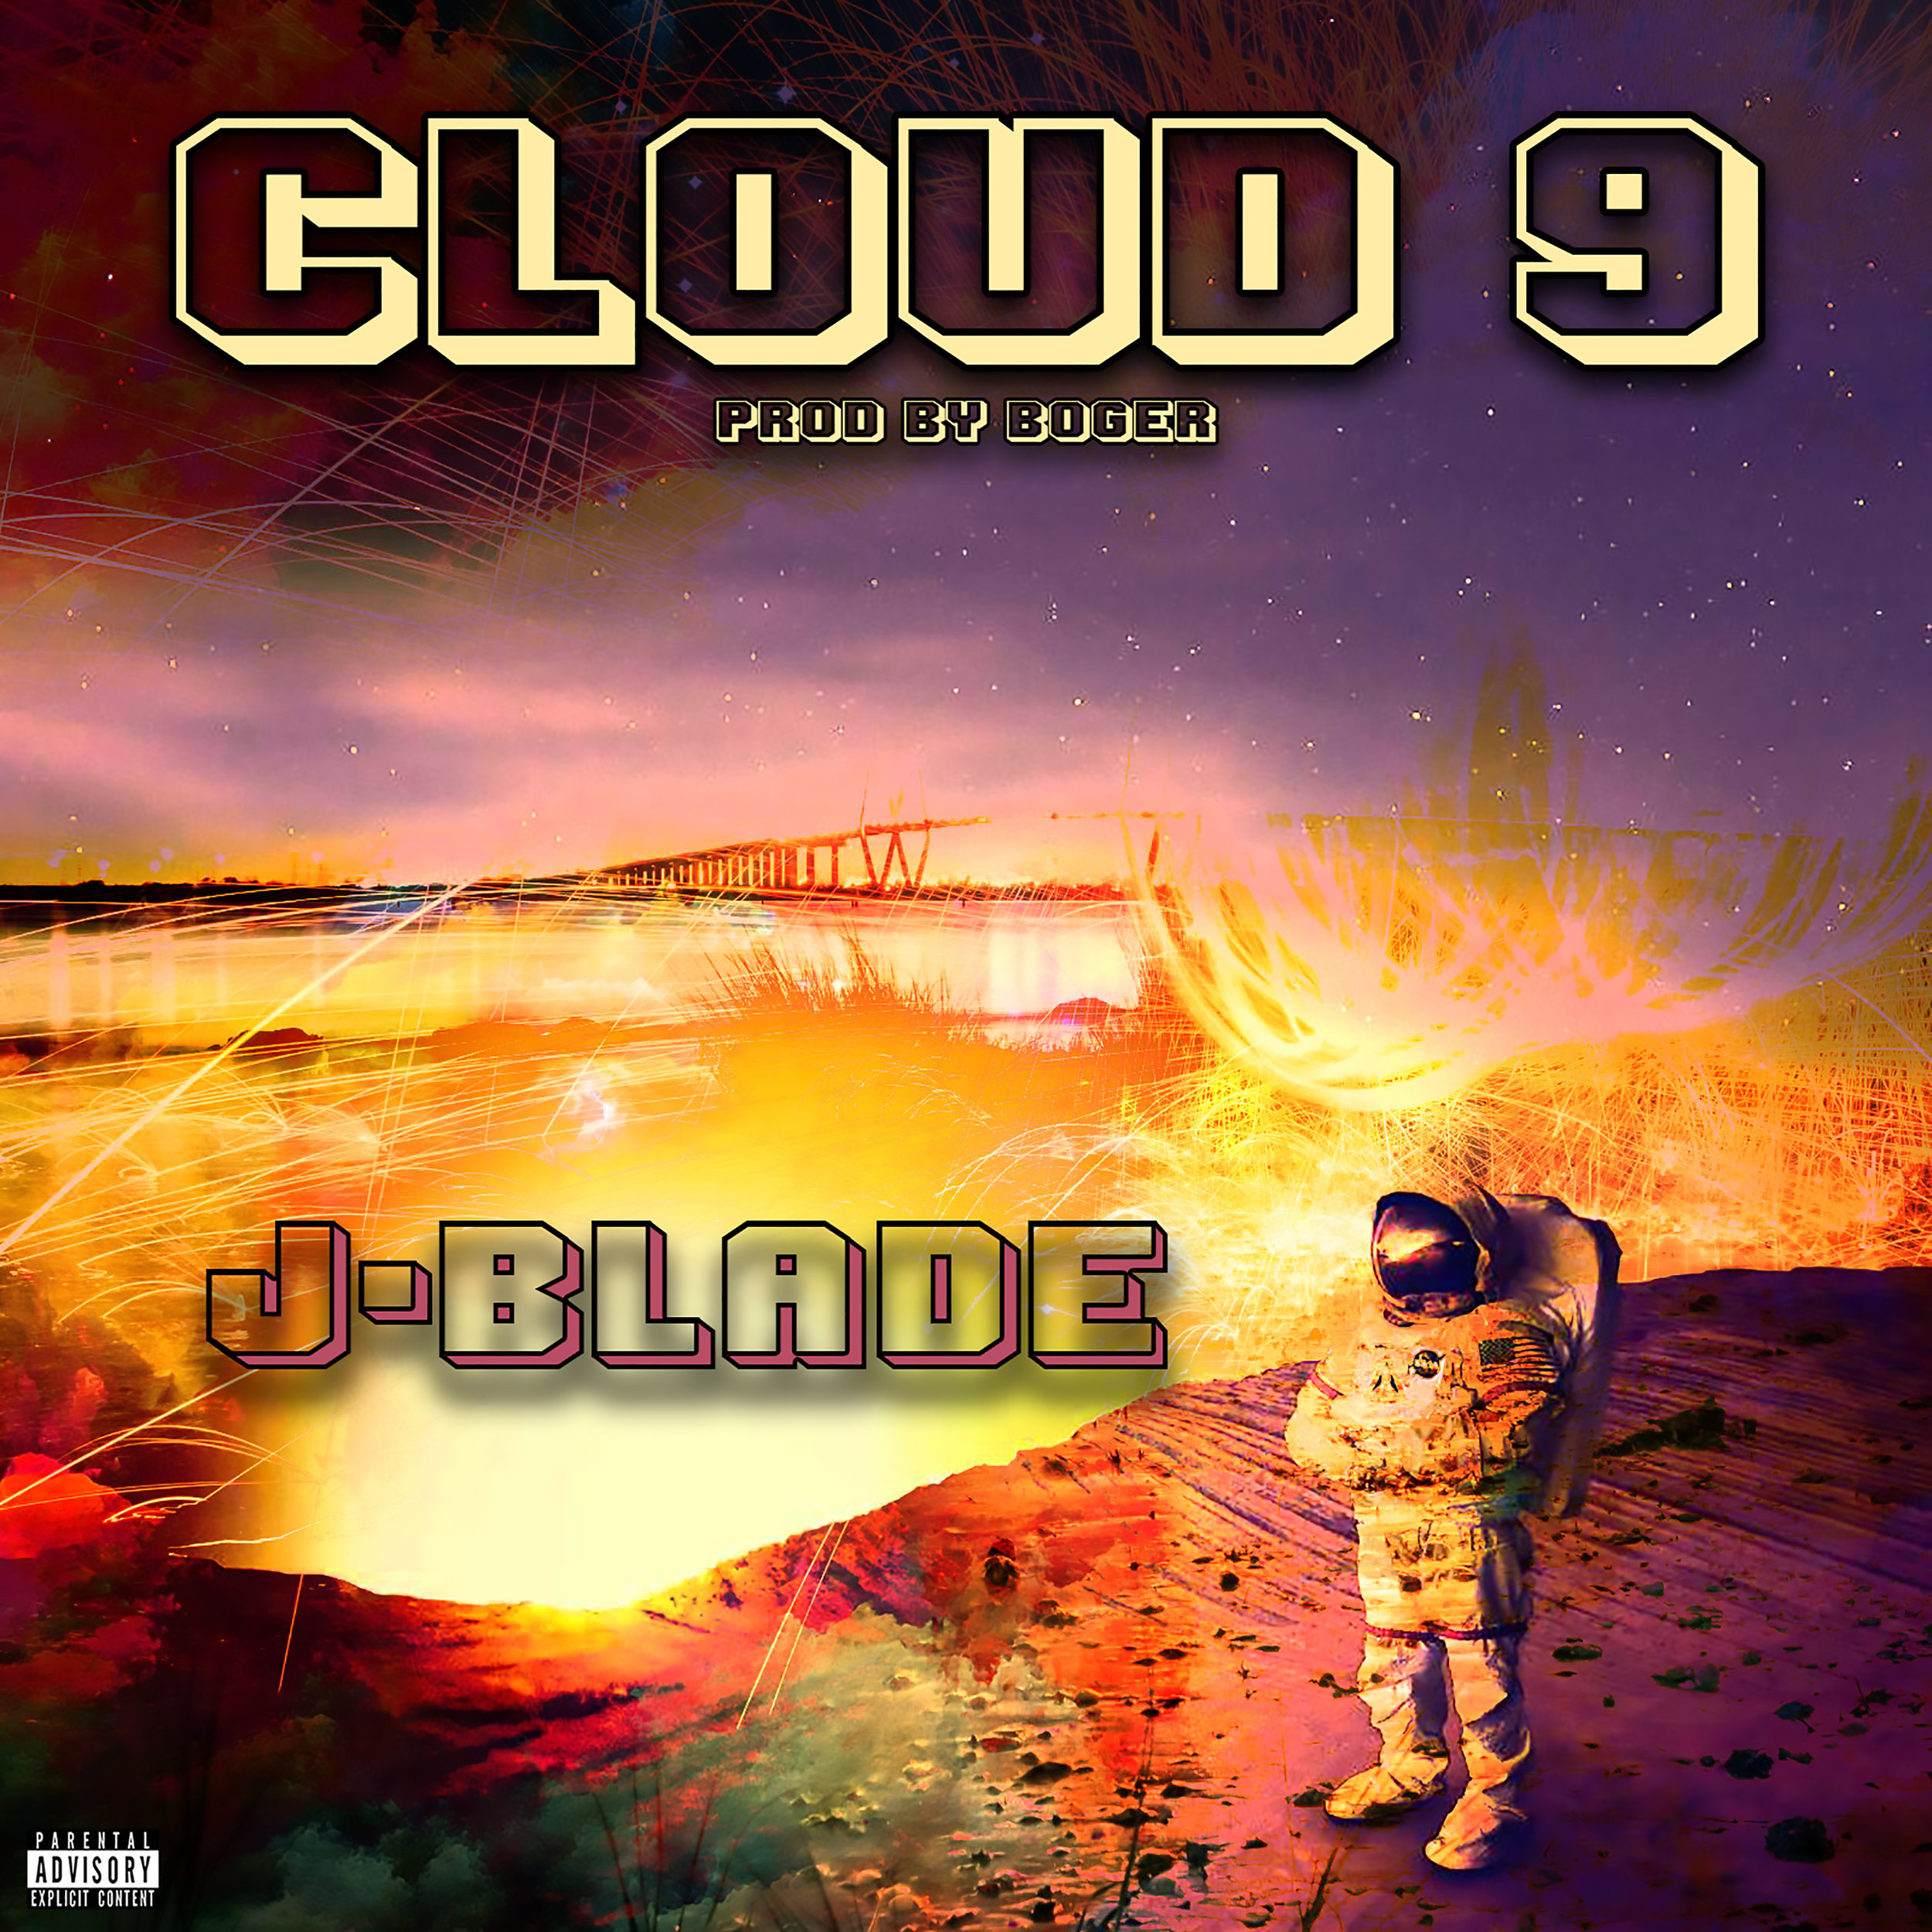 J-Blade - Cloud 9 - Expl.jpeg